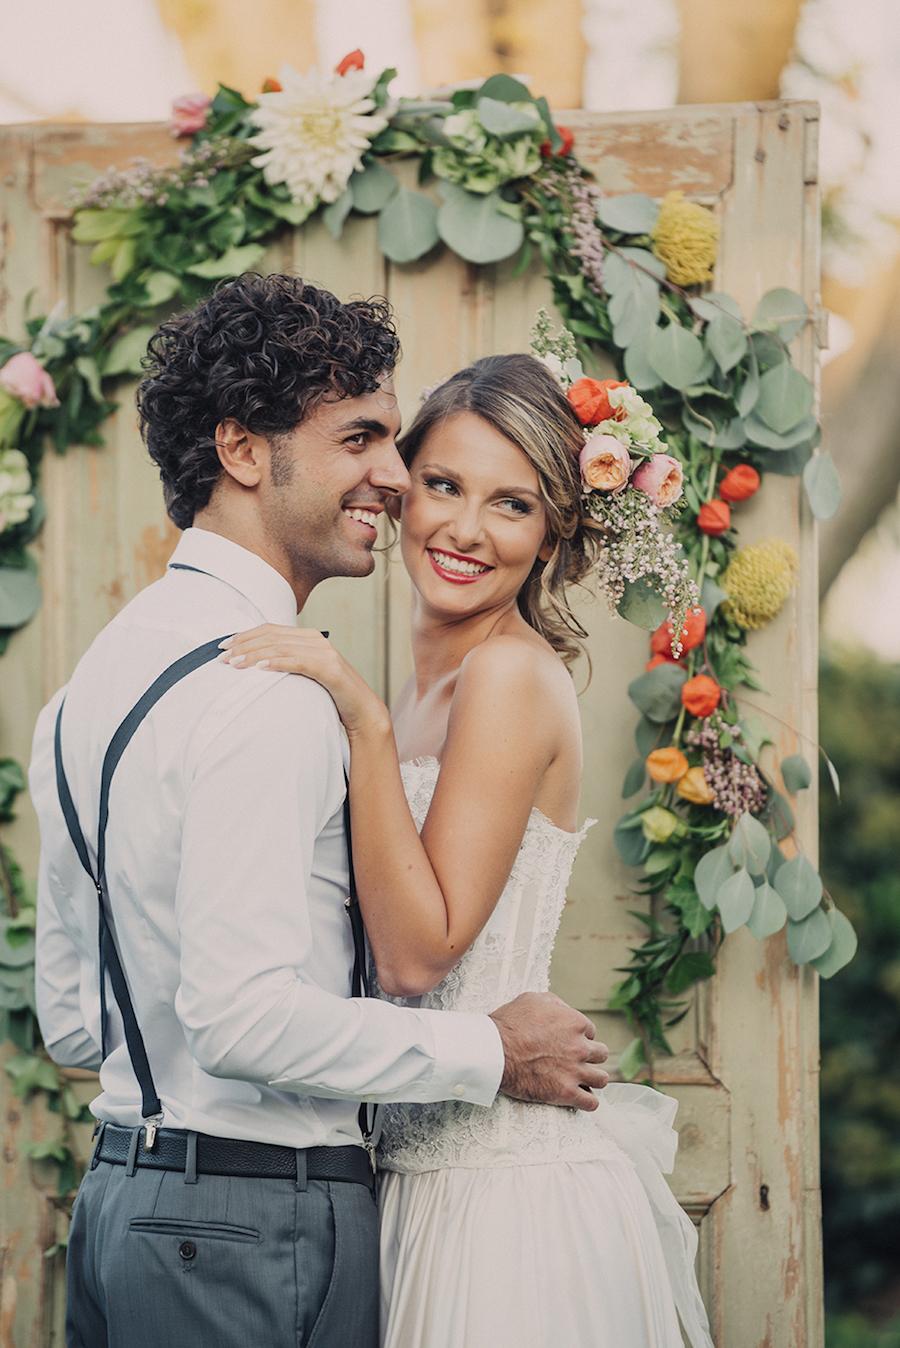 matrimonio-bucolico-boho-chic-gradisca-portento-wedding-wonderland-16